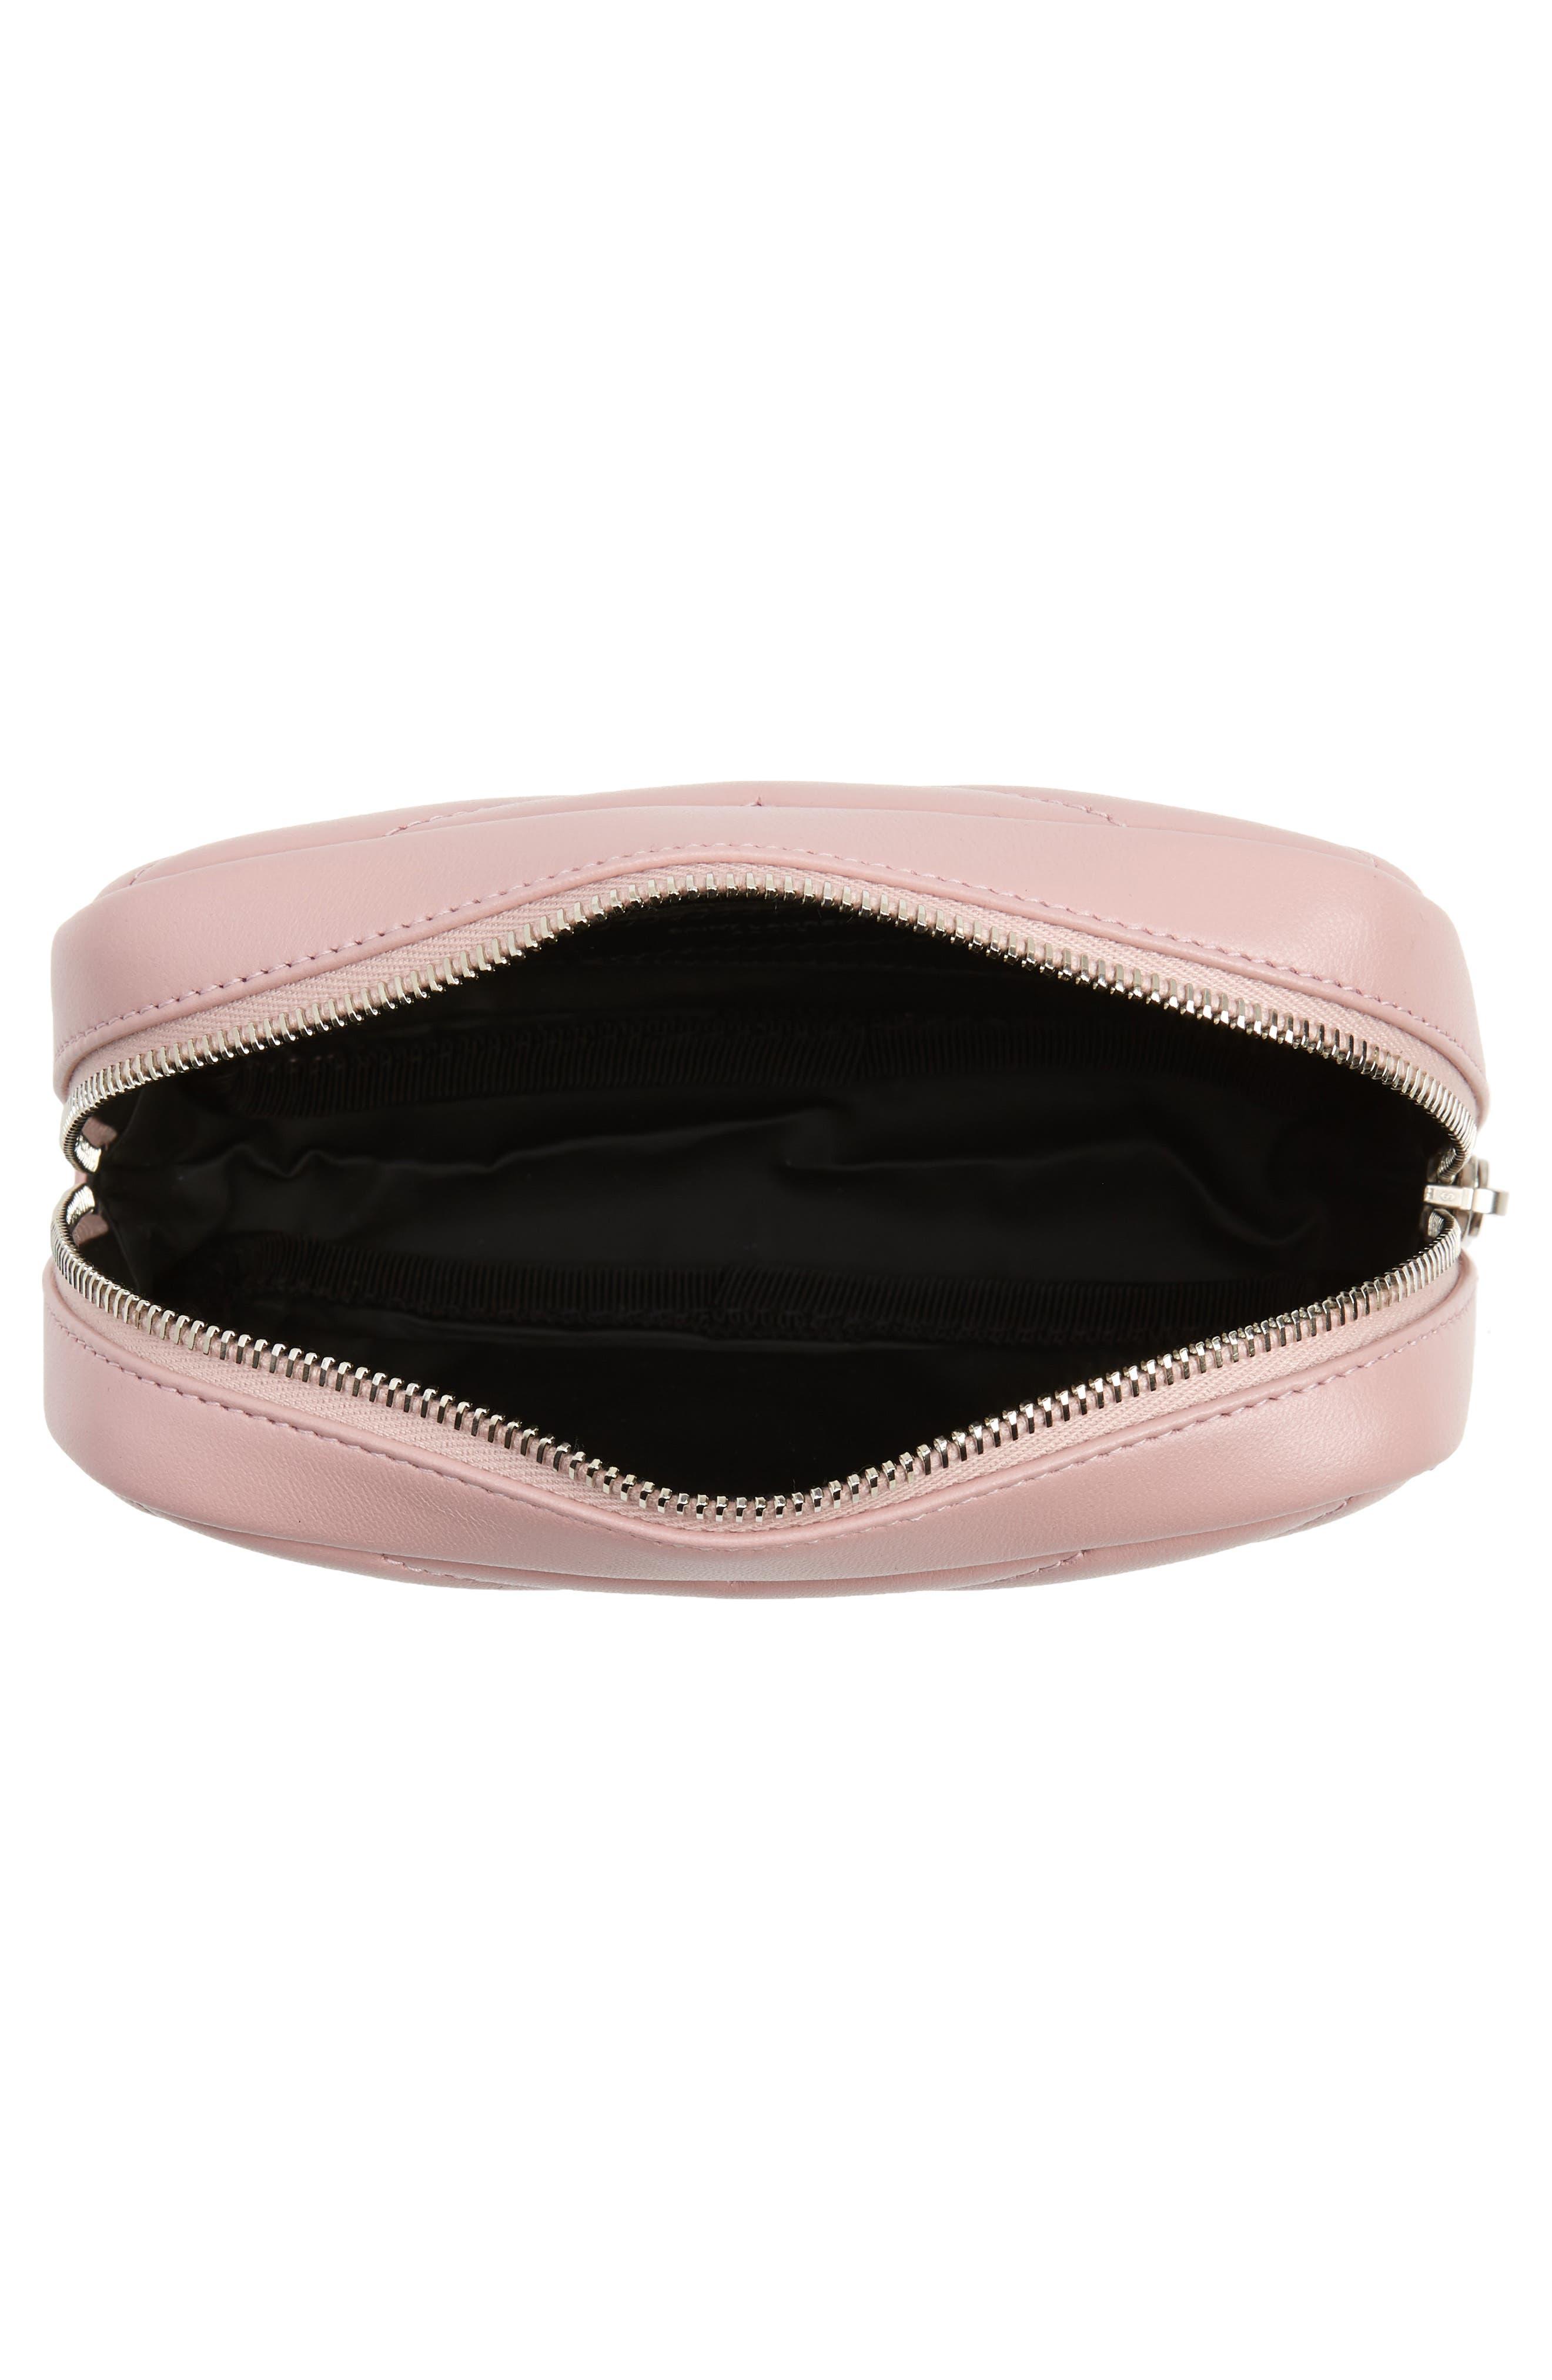 Loulou Matelassé Leather Cosmetics Bag,                             Alternate thumbnail 3, color,                             Tender Pink